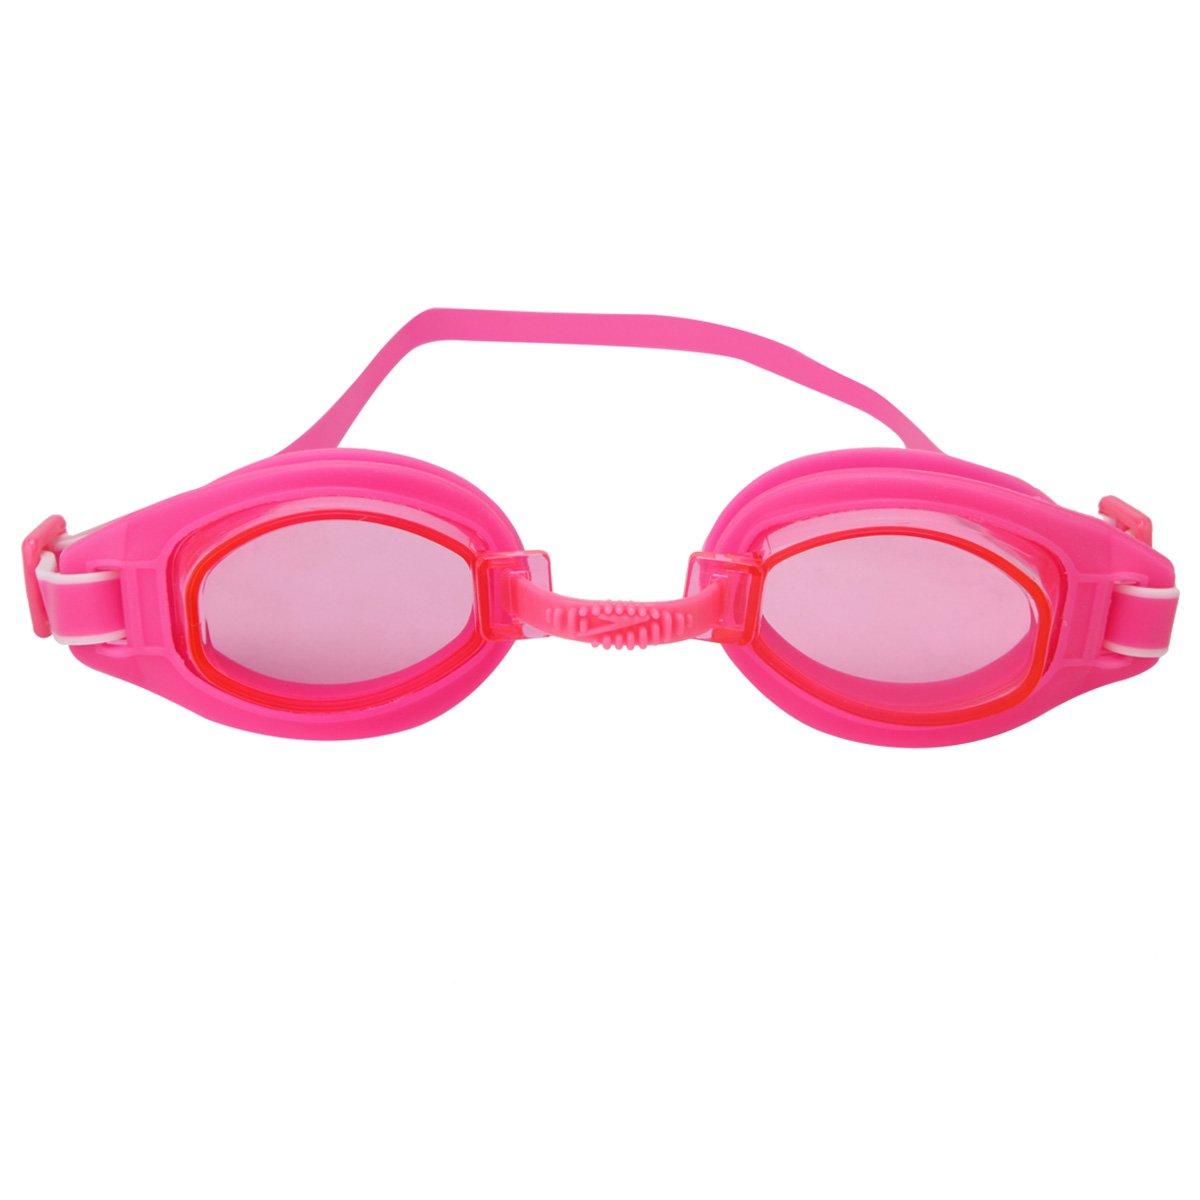 Kit Óculos + Touca Speedo + Protetor de Ouvido Swim Kit 3.0 - Rosa ... 8f07a65085e